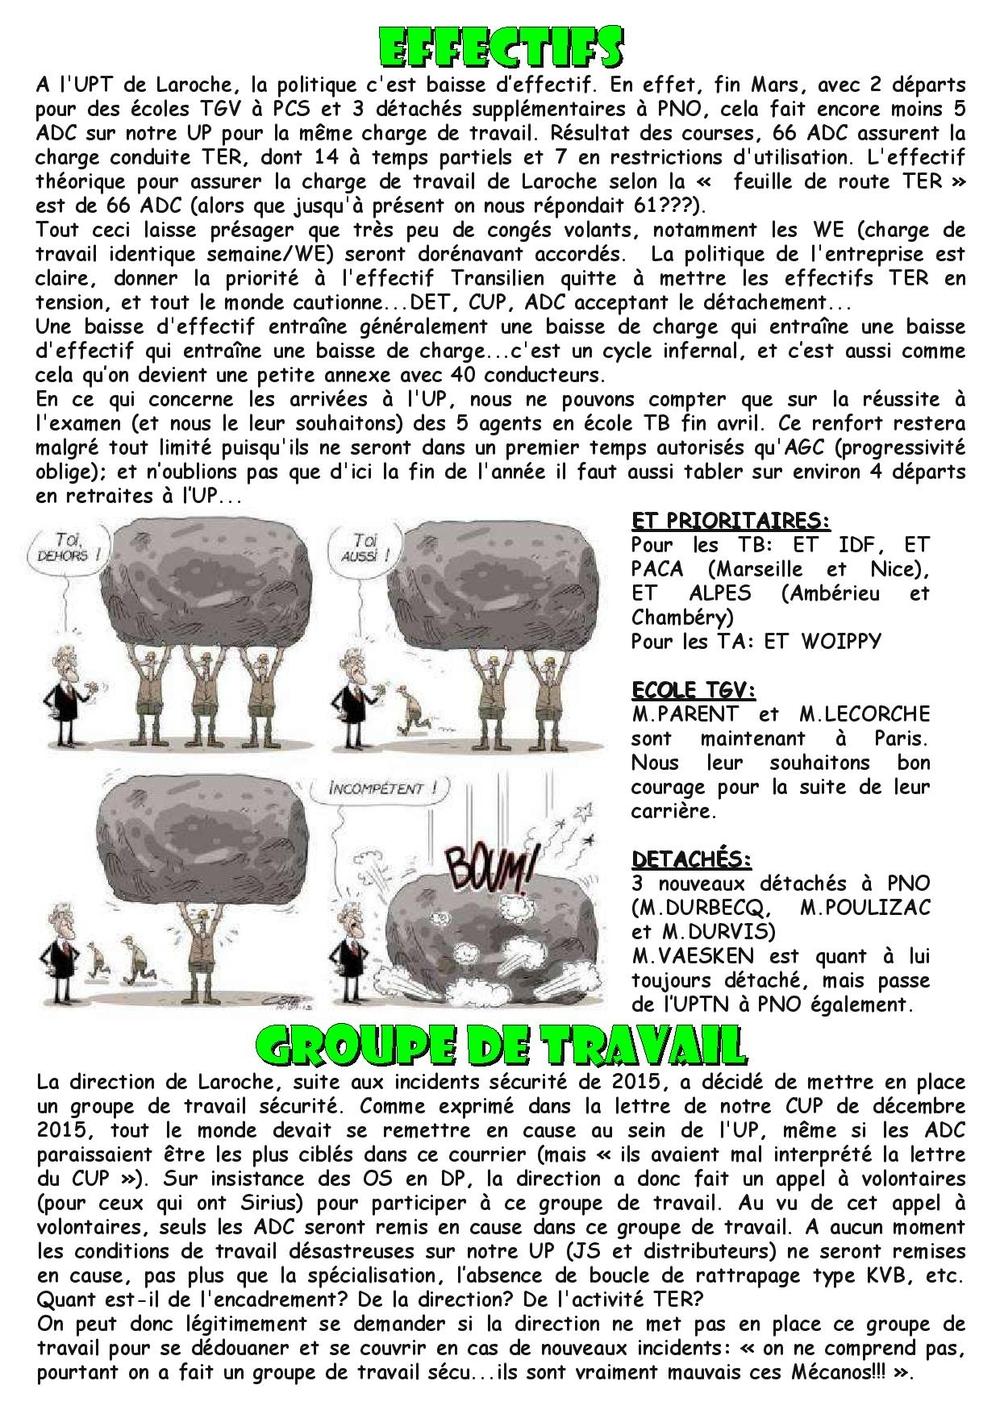 uptlar crdp 03-2016-page-005